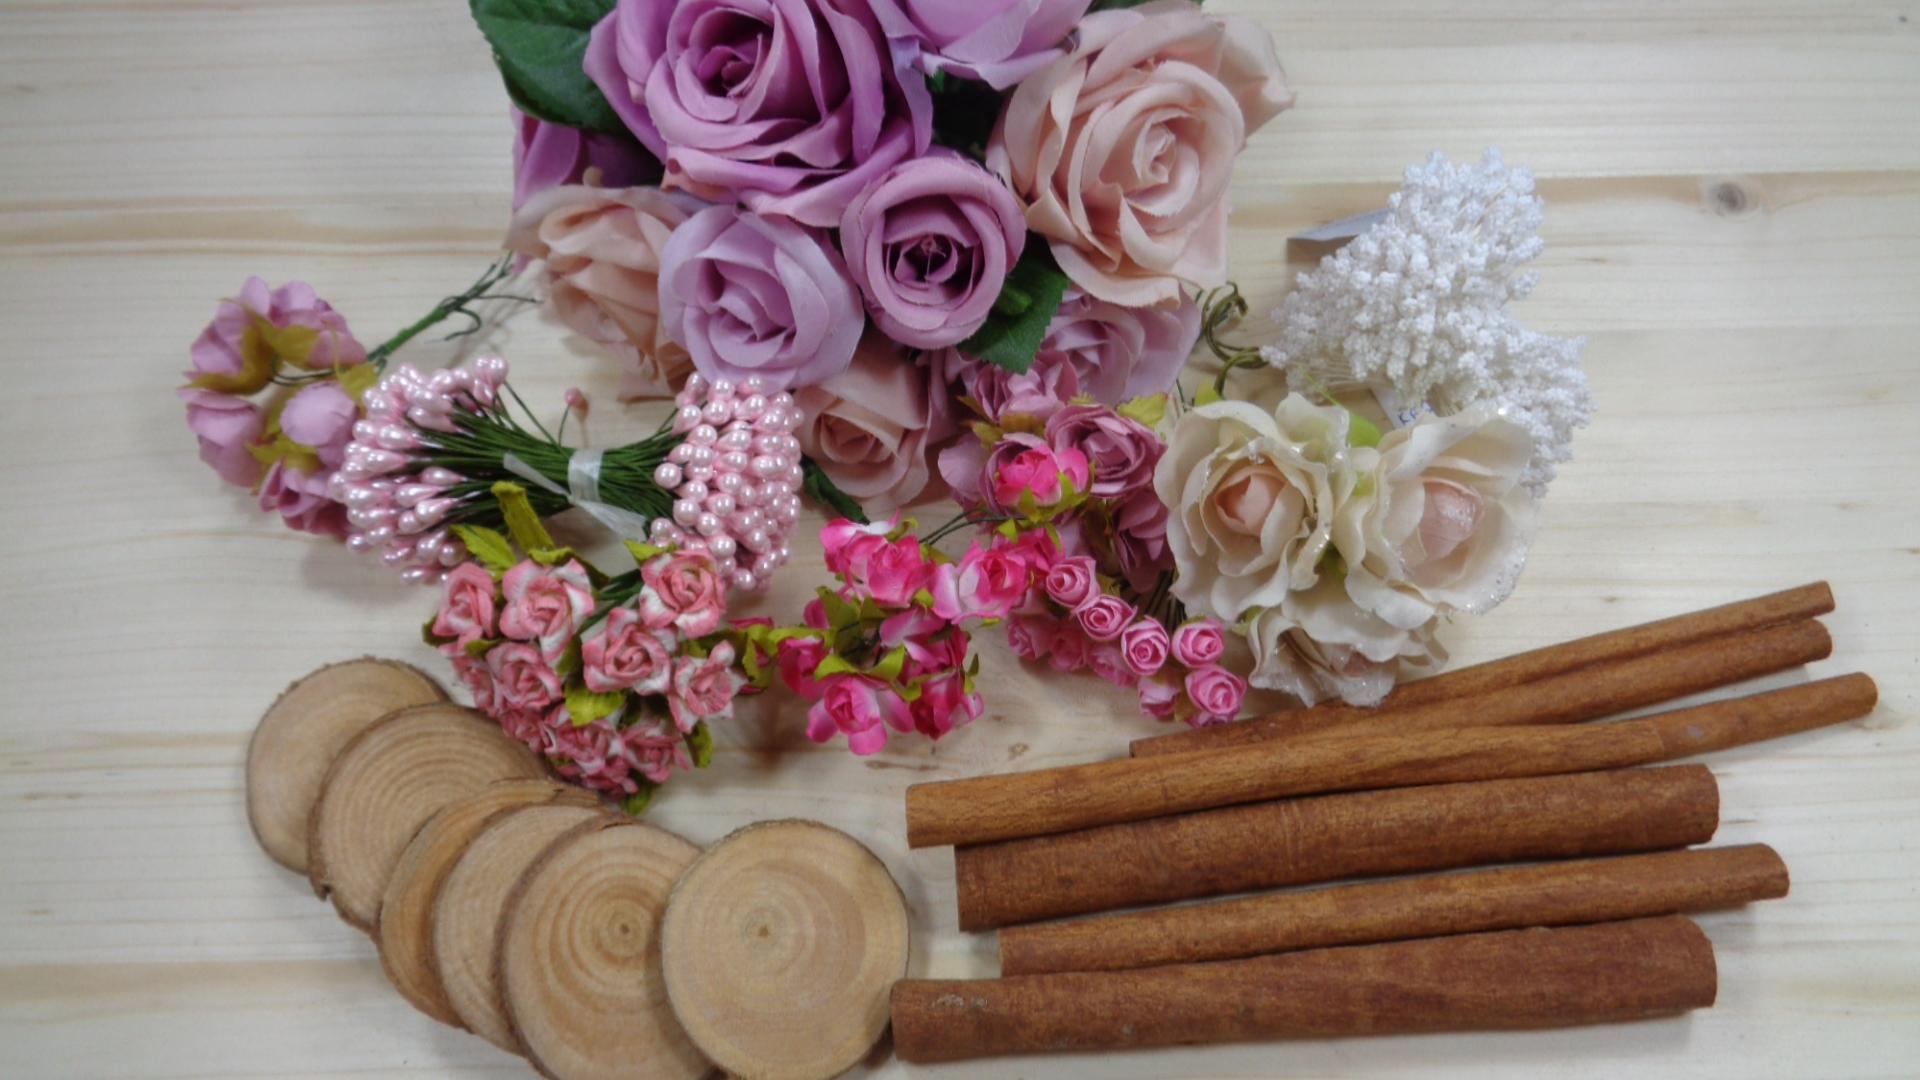 81e3dfad16f3 Καρποί- Λουλούδια - Υλικά χειροτεχνίας-κατασκευής